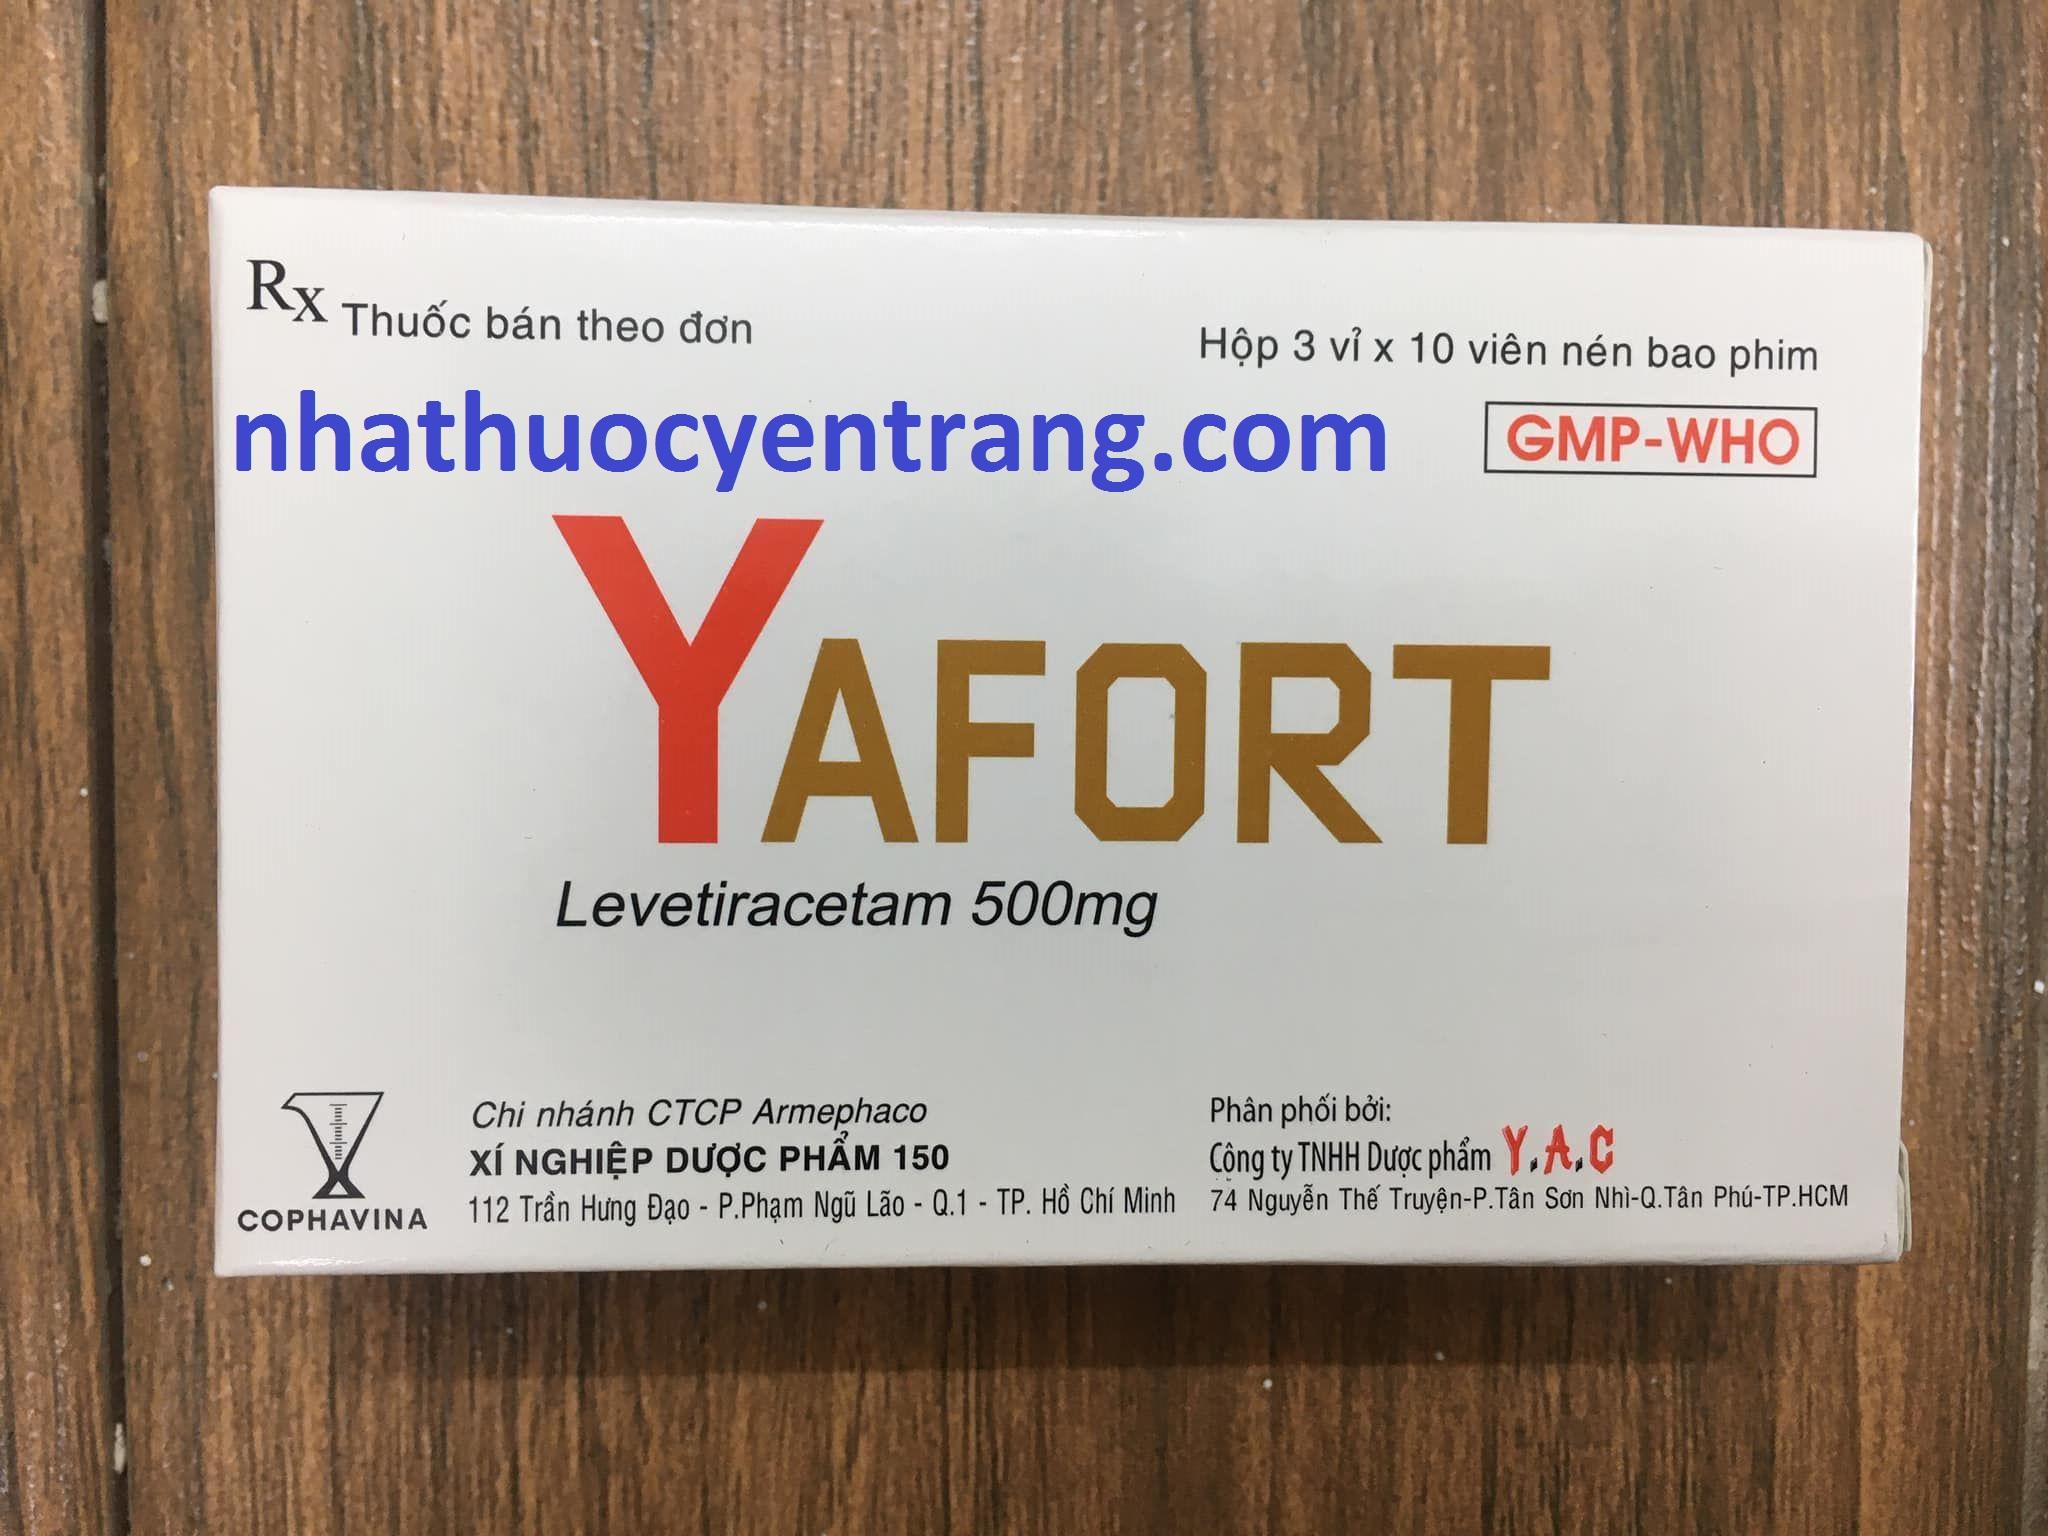 Yafort